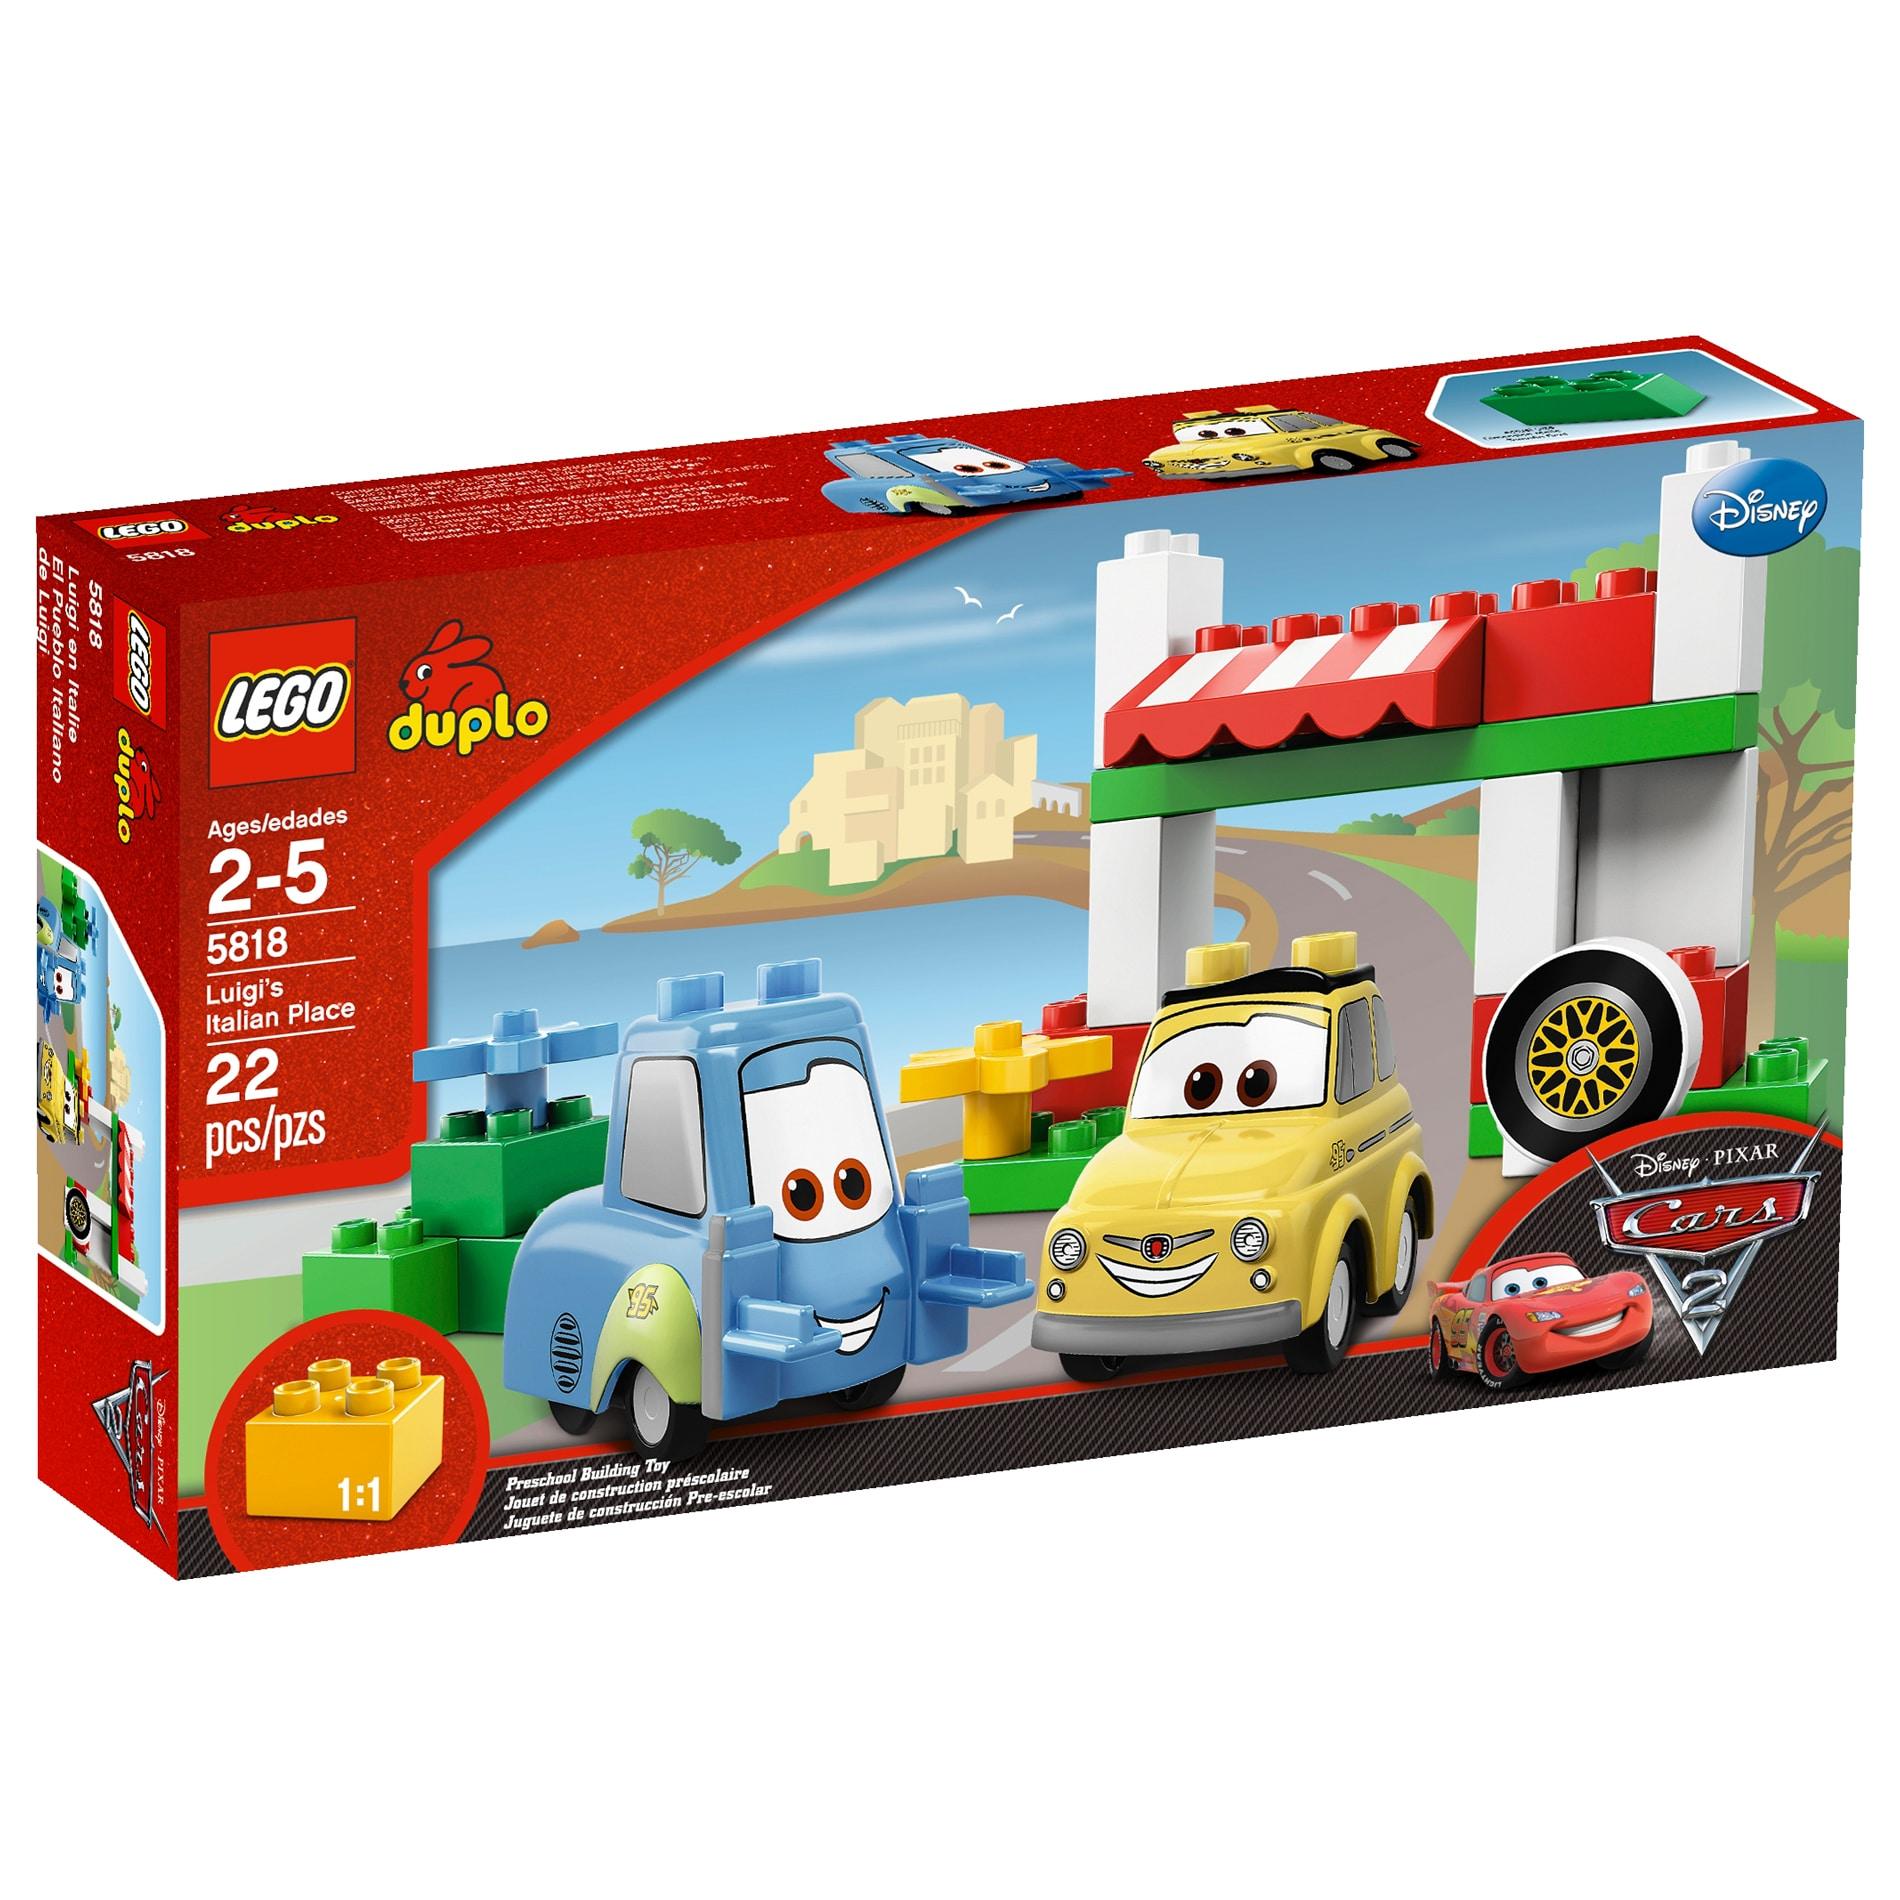 LEGO Cars Luigis Italian Place Toy Set